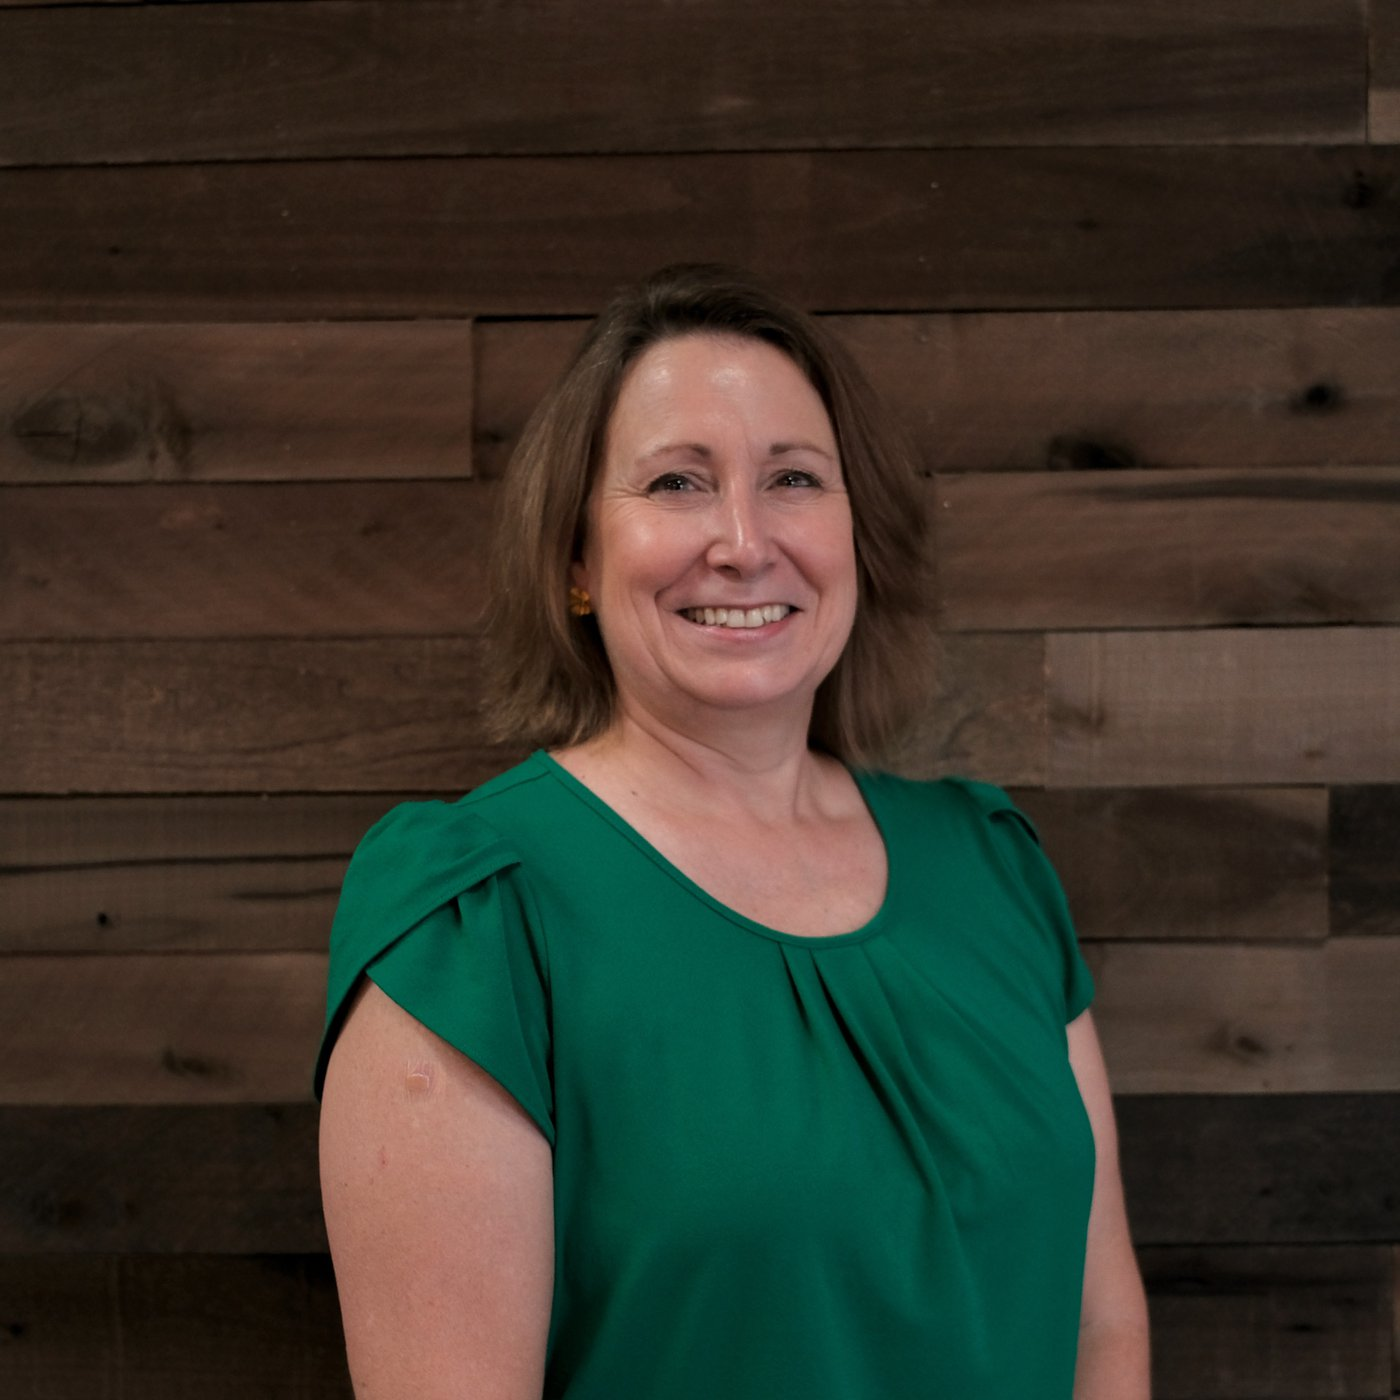 Team Development Leader Amy Gieger